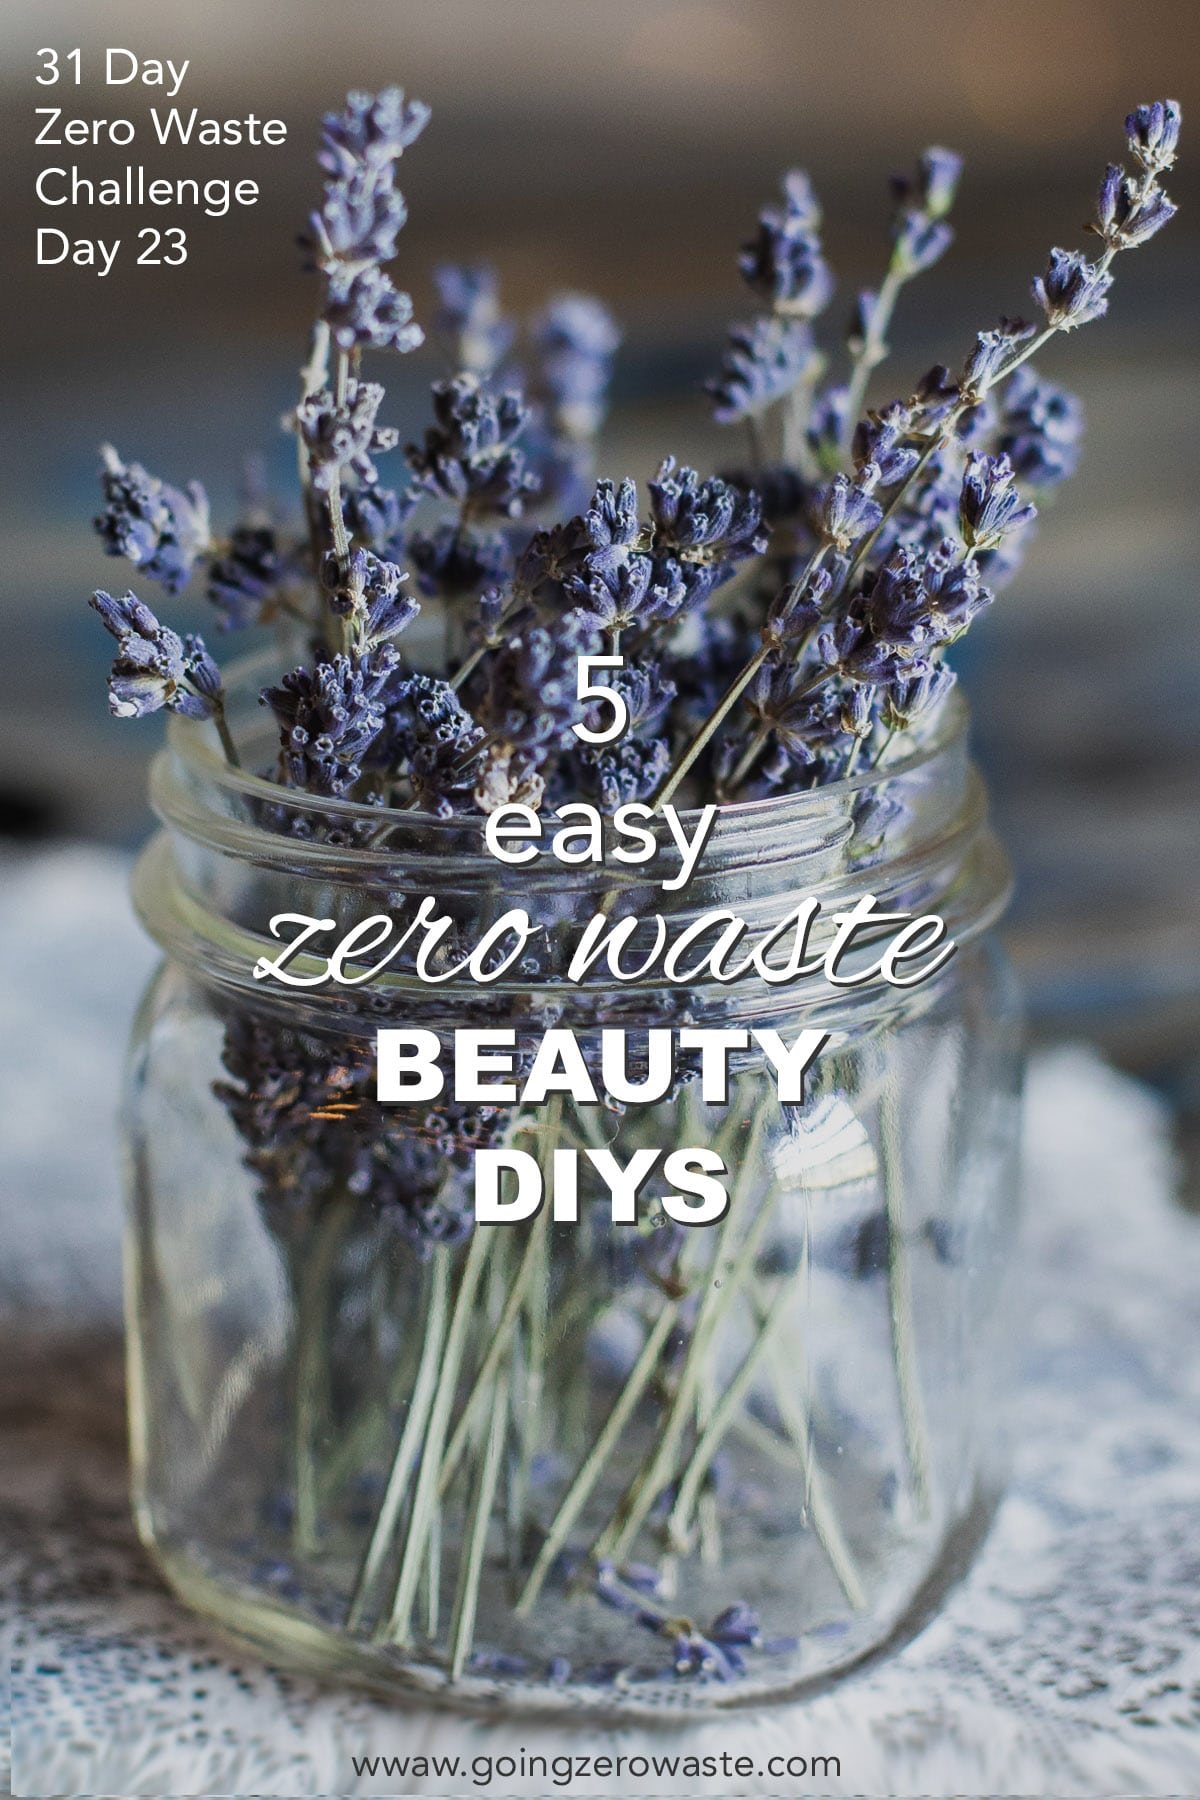 5 Easy Beauty DIYs - Day 23 of the Zero Waste Challenge from www.goingzerowaste.com #zerowaste #ecofriendly #gogreen #sustainable #zerowastechallenge #challenge #sustainablelivingchallenge #zerowaste #beauty DIYs #skincare